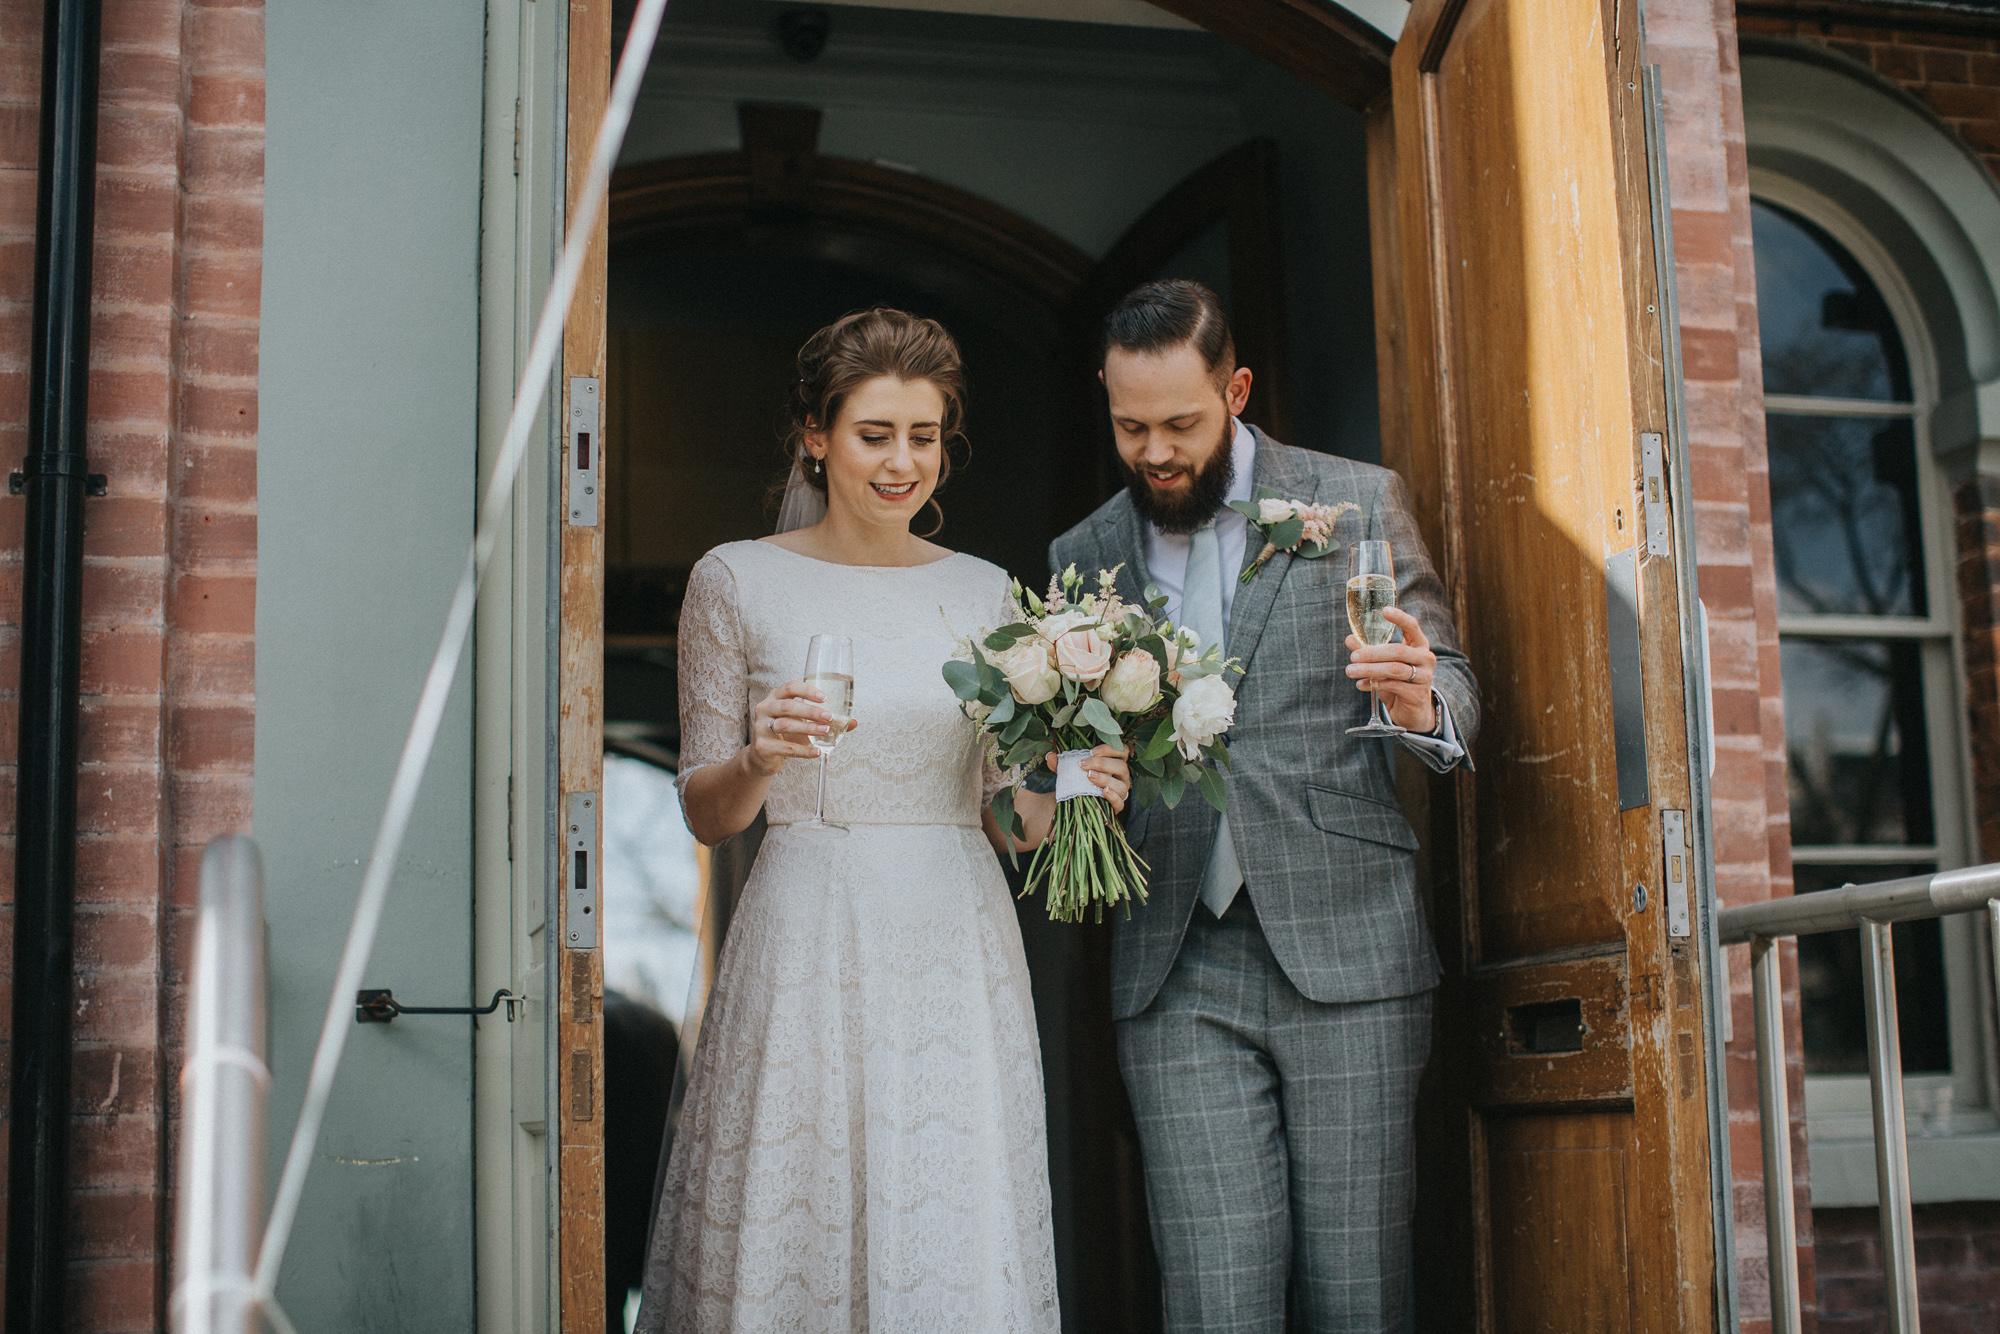 Kate-Beaumont-Lace-Flared-Dahlia-Gown-Leeds-Wedding-Bloom-Weddings-27.jpg